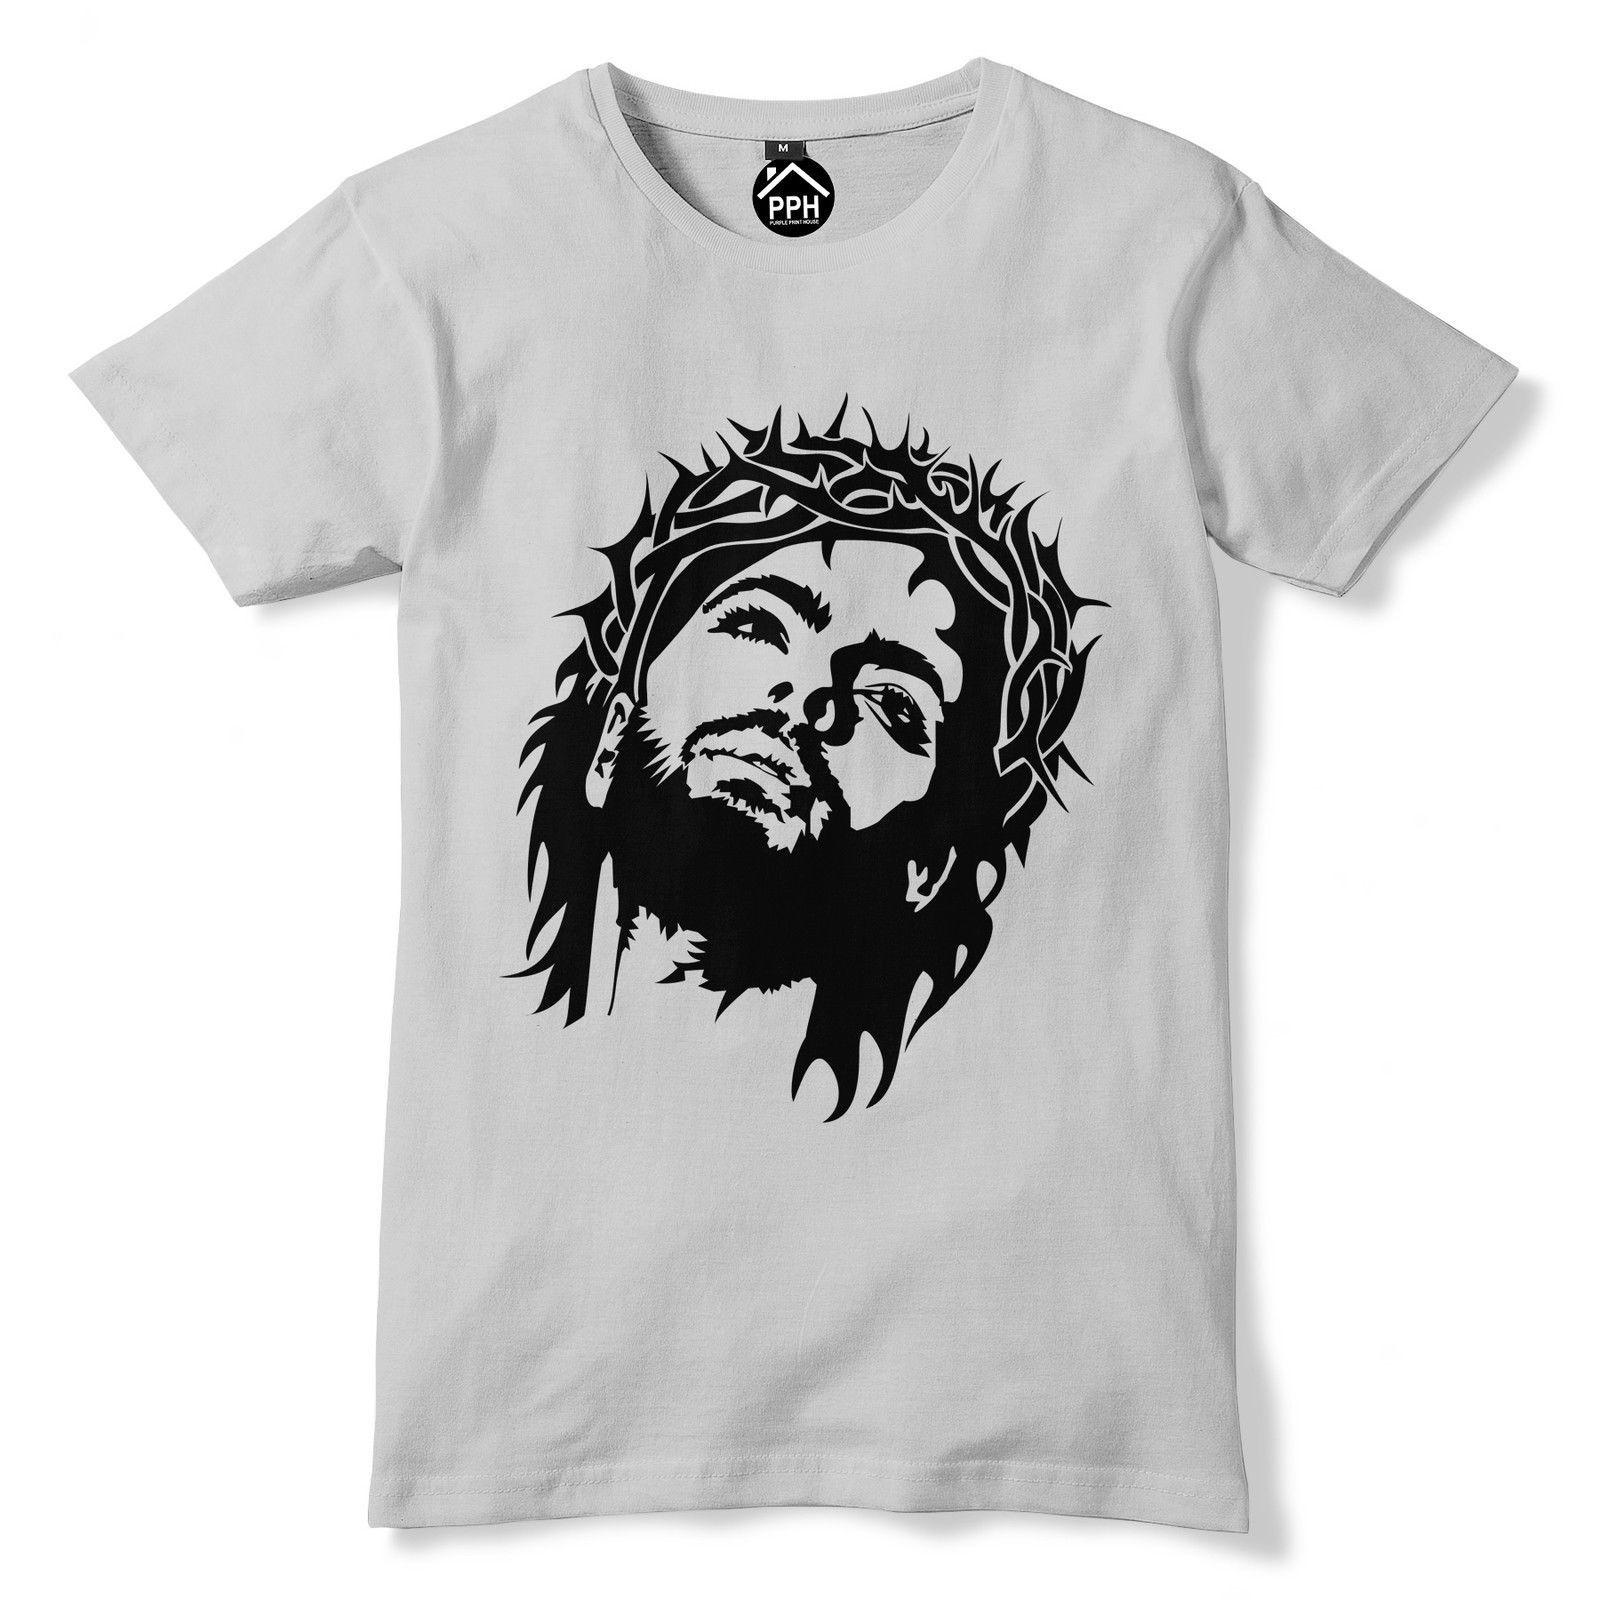 Jesus Christ Face Tshirt Retro Religion Cross Crucifix Top Men Man Shirt 389  Free shipping Tops t-shirt Fashion